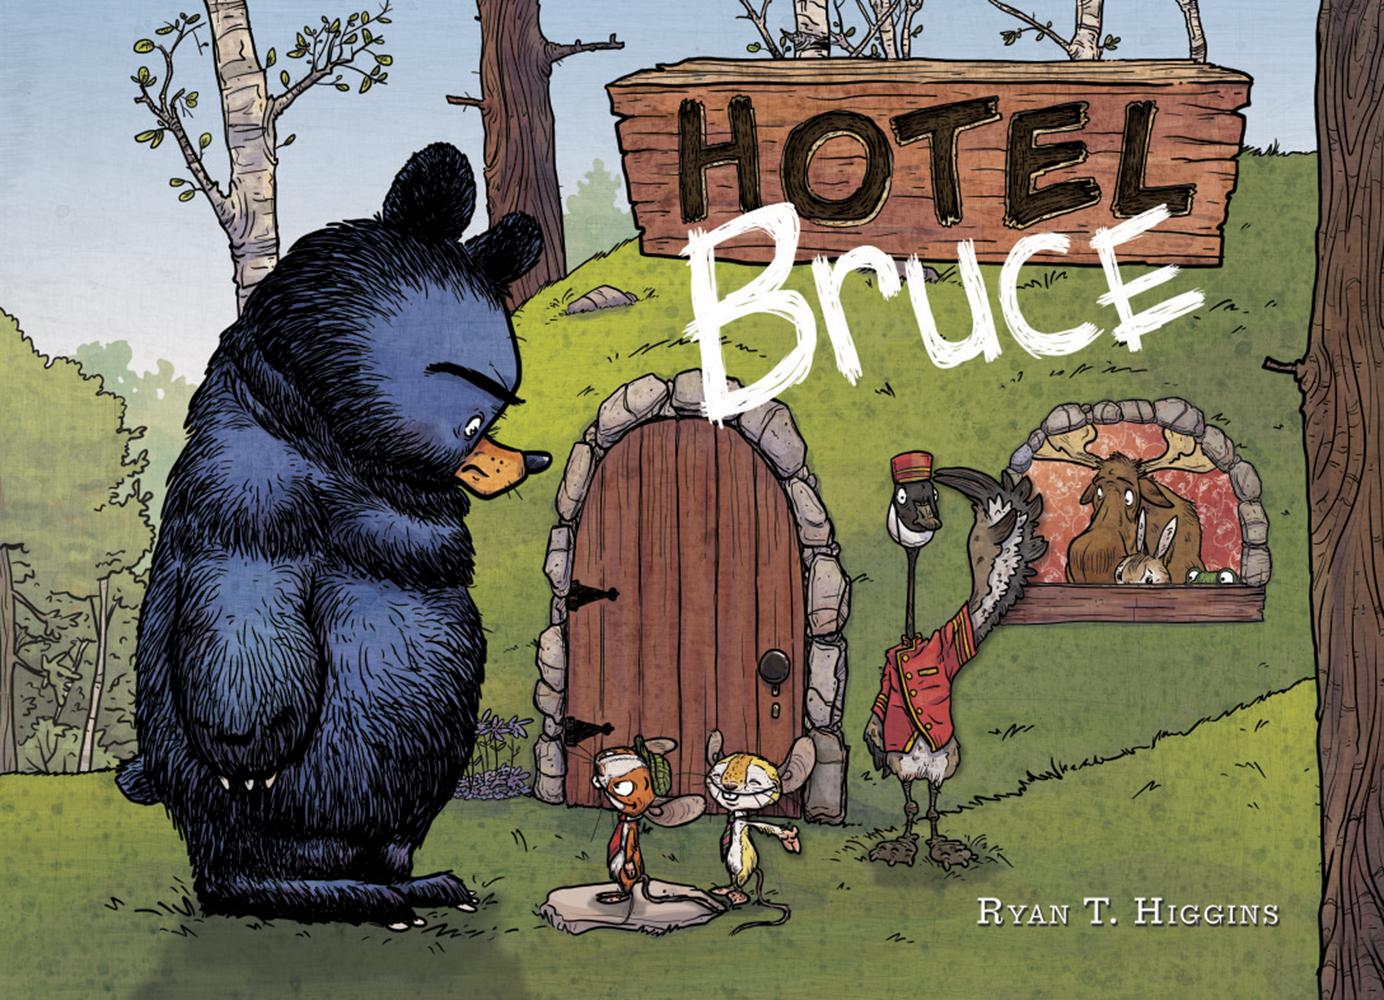 Higgins, Ryan T 2016_10 - HOTEL BRUCE - PB - RLM PR.jpg